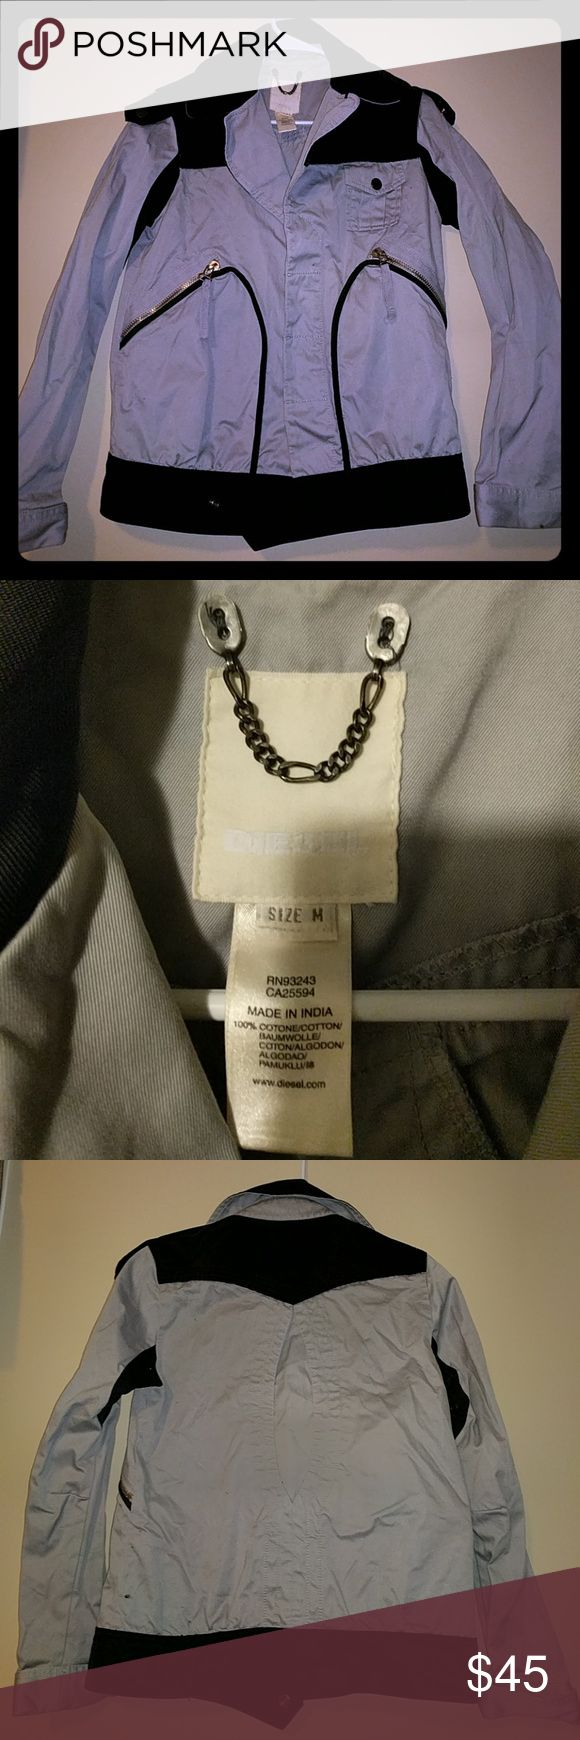 🛍️ SATURDAY SALE🛍️ DIESEL light jacket Grey and black jacket Diesel Jackets & Coats